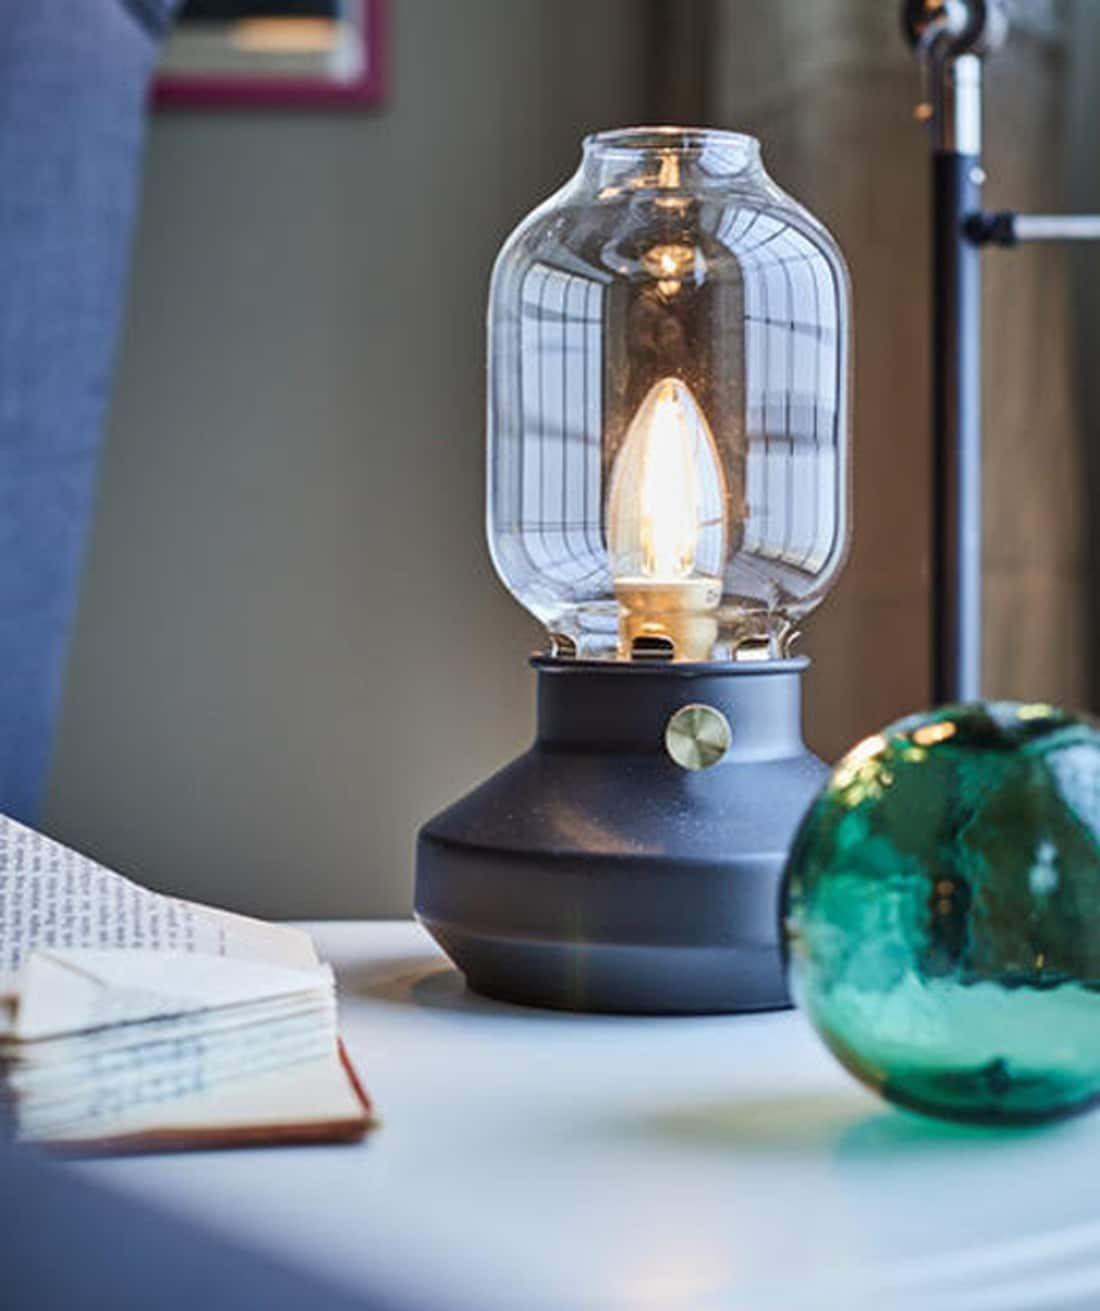 de hogar formas iluminaciónDecohouse con la tu alegrar 8 uF1J5T3lKc